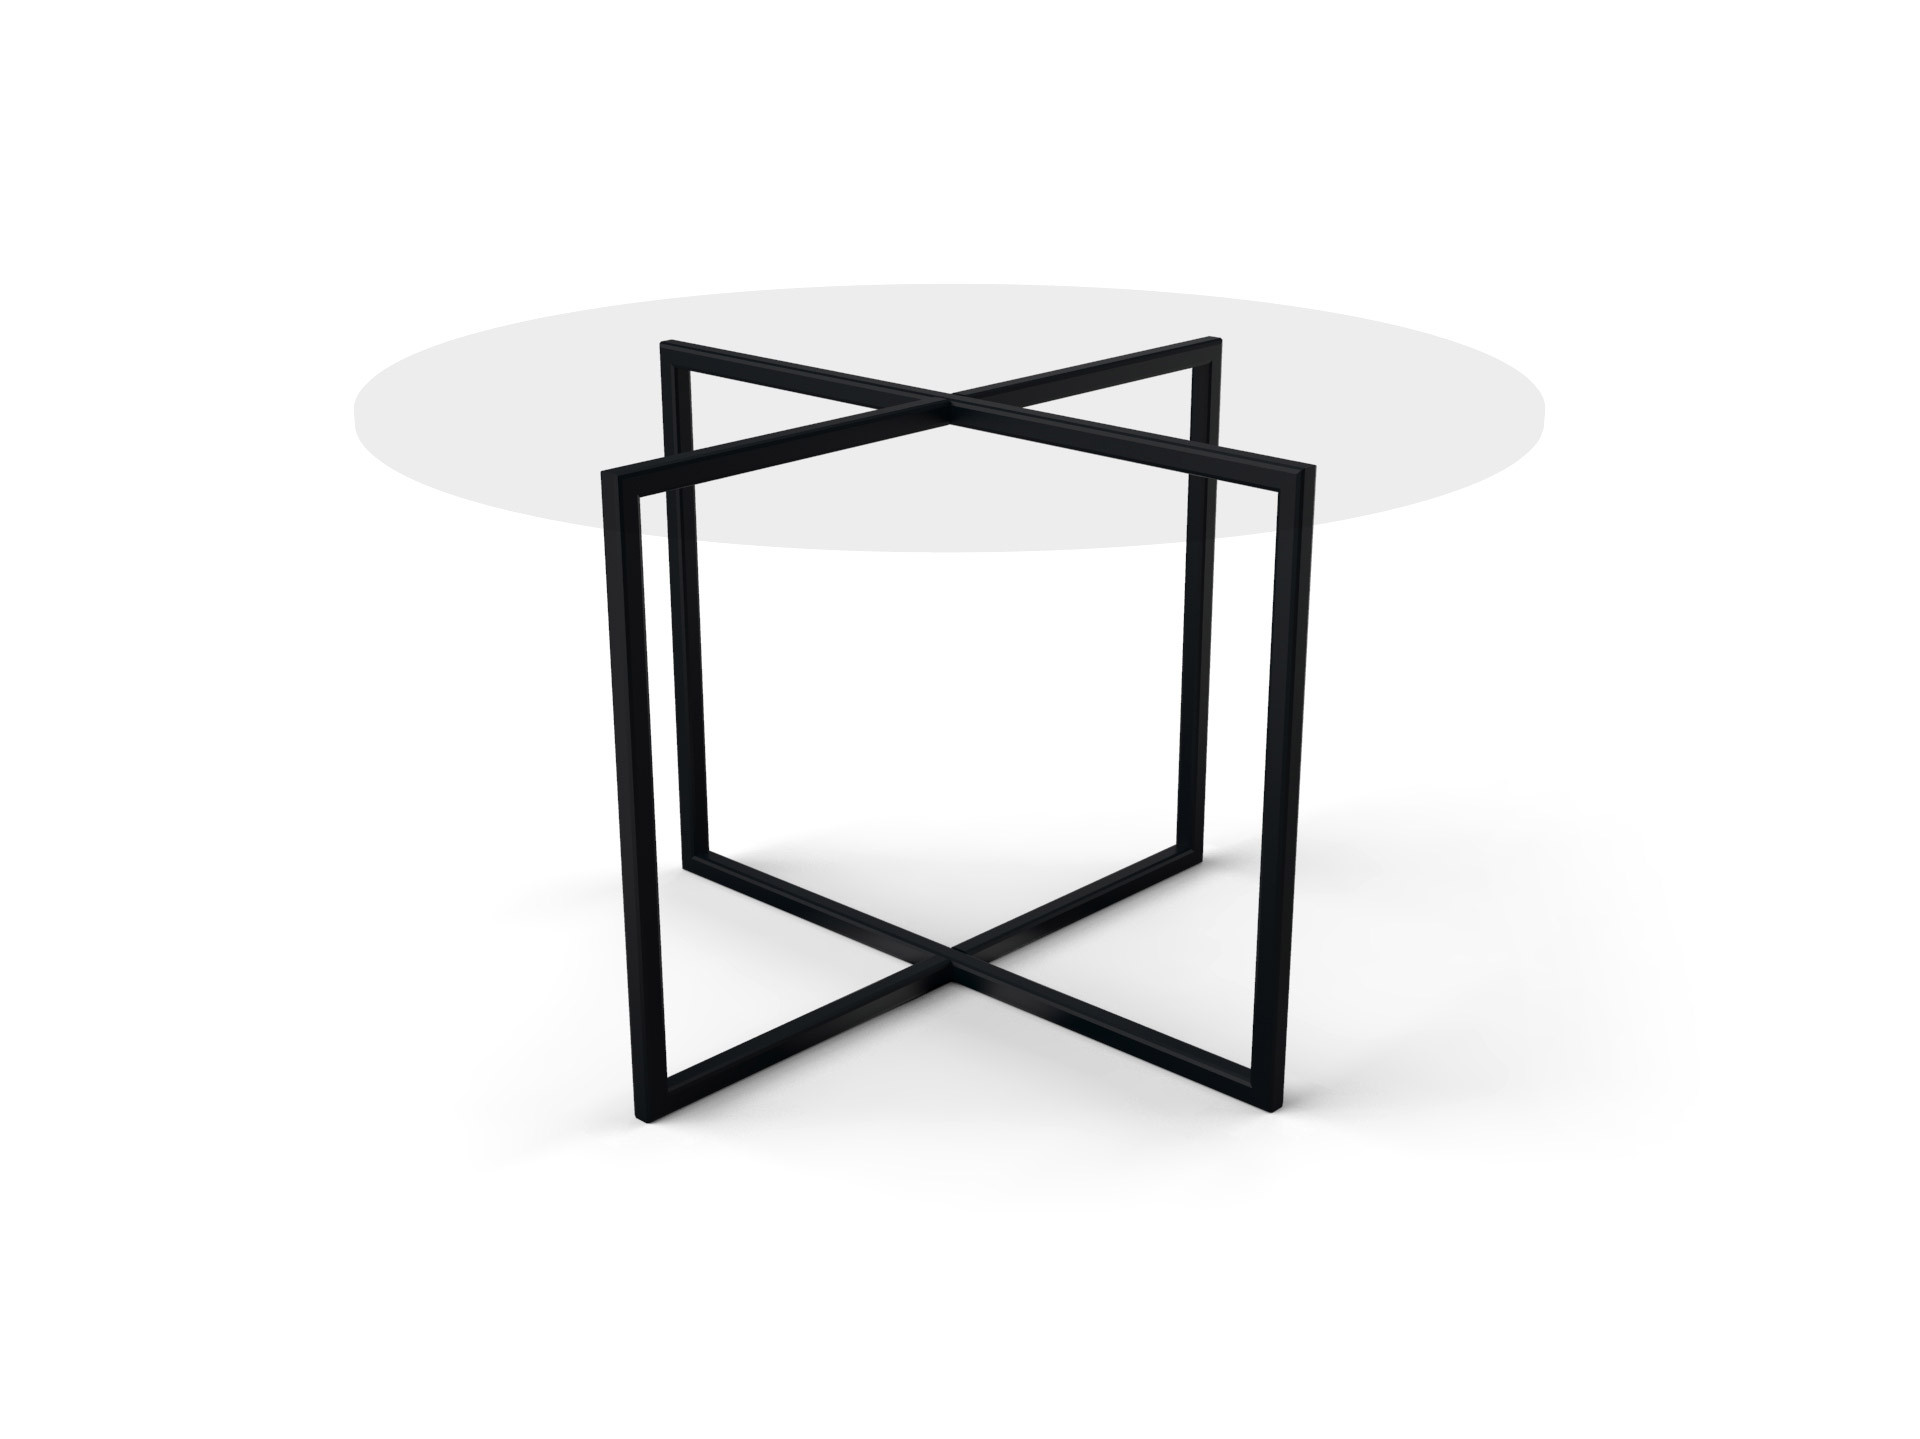 Tafelonderstel Lugo 2180x980mm zwart (mat, zandkorrelstructuur) gecoat